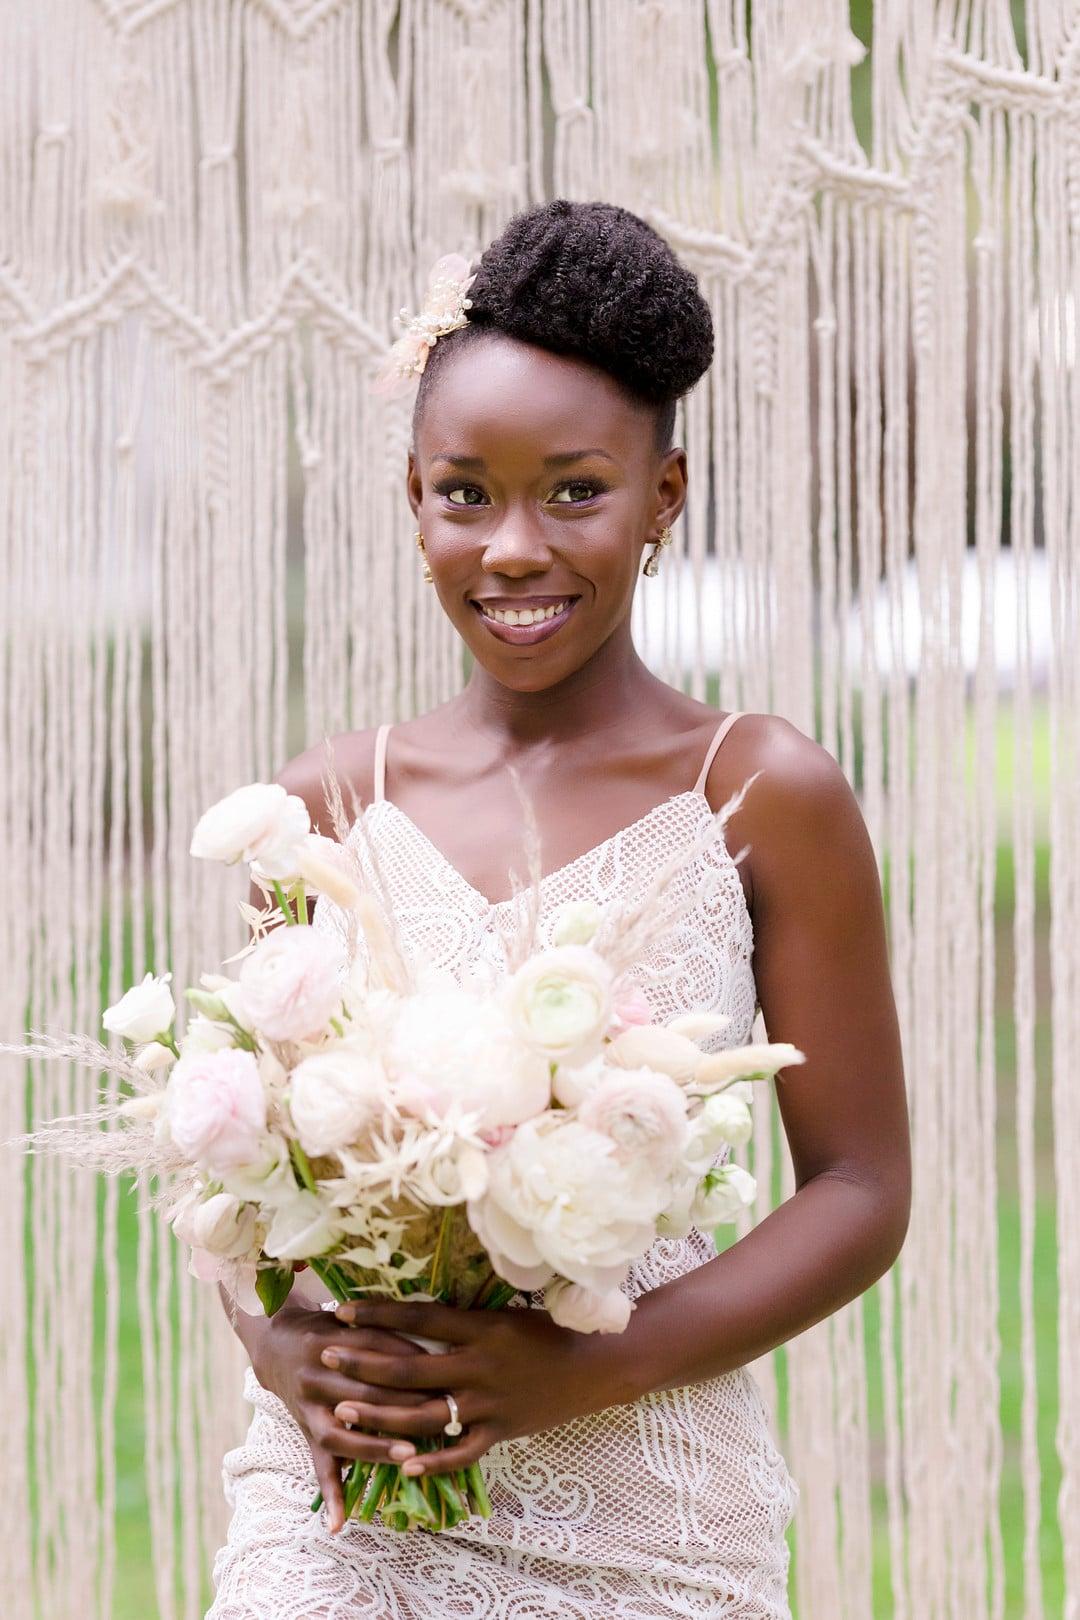 Elegant Boho Wedding Picnic_Susan Dixon Photography, LLC_susan-dixon-017_low